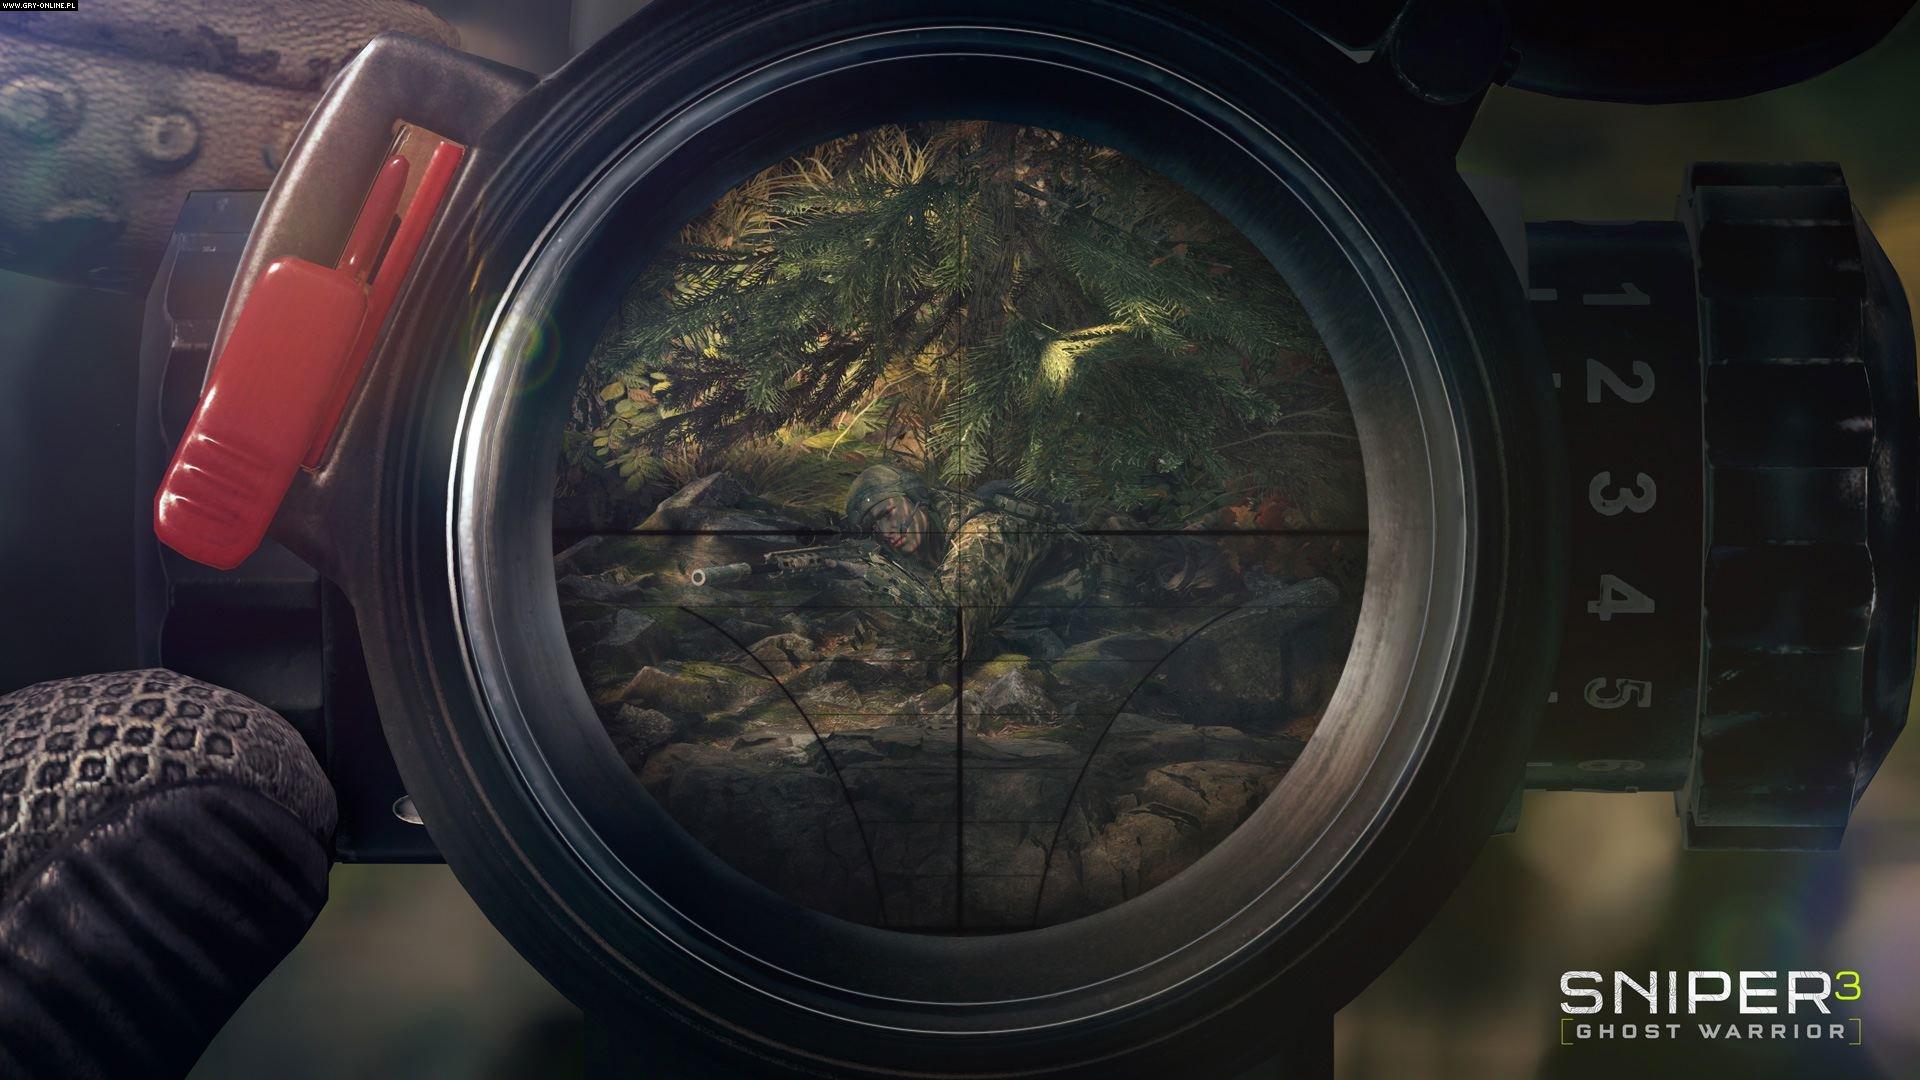 Sniper: Ghost Warrior 3 PC, PS4, XONE Games Image 36/36, CI Games / City Interactive